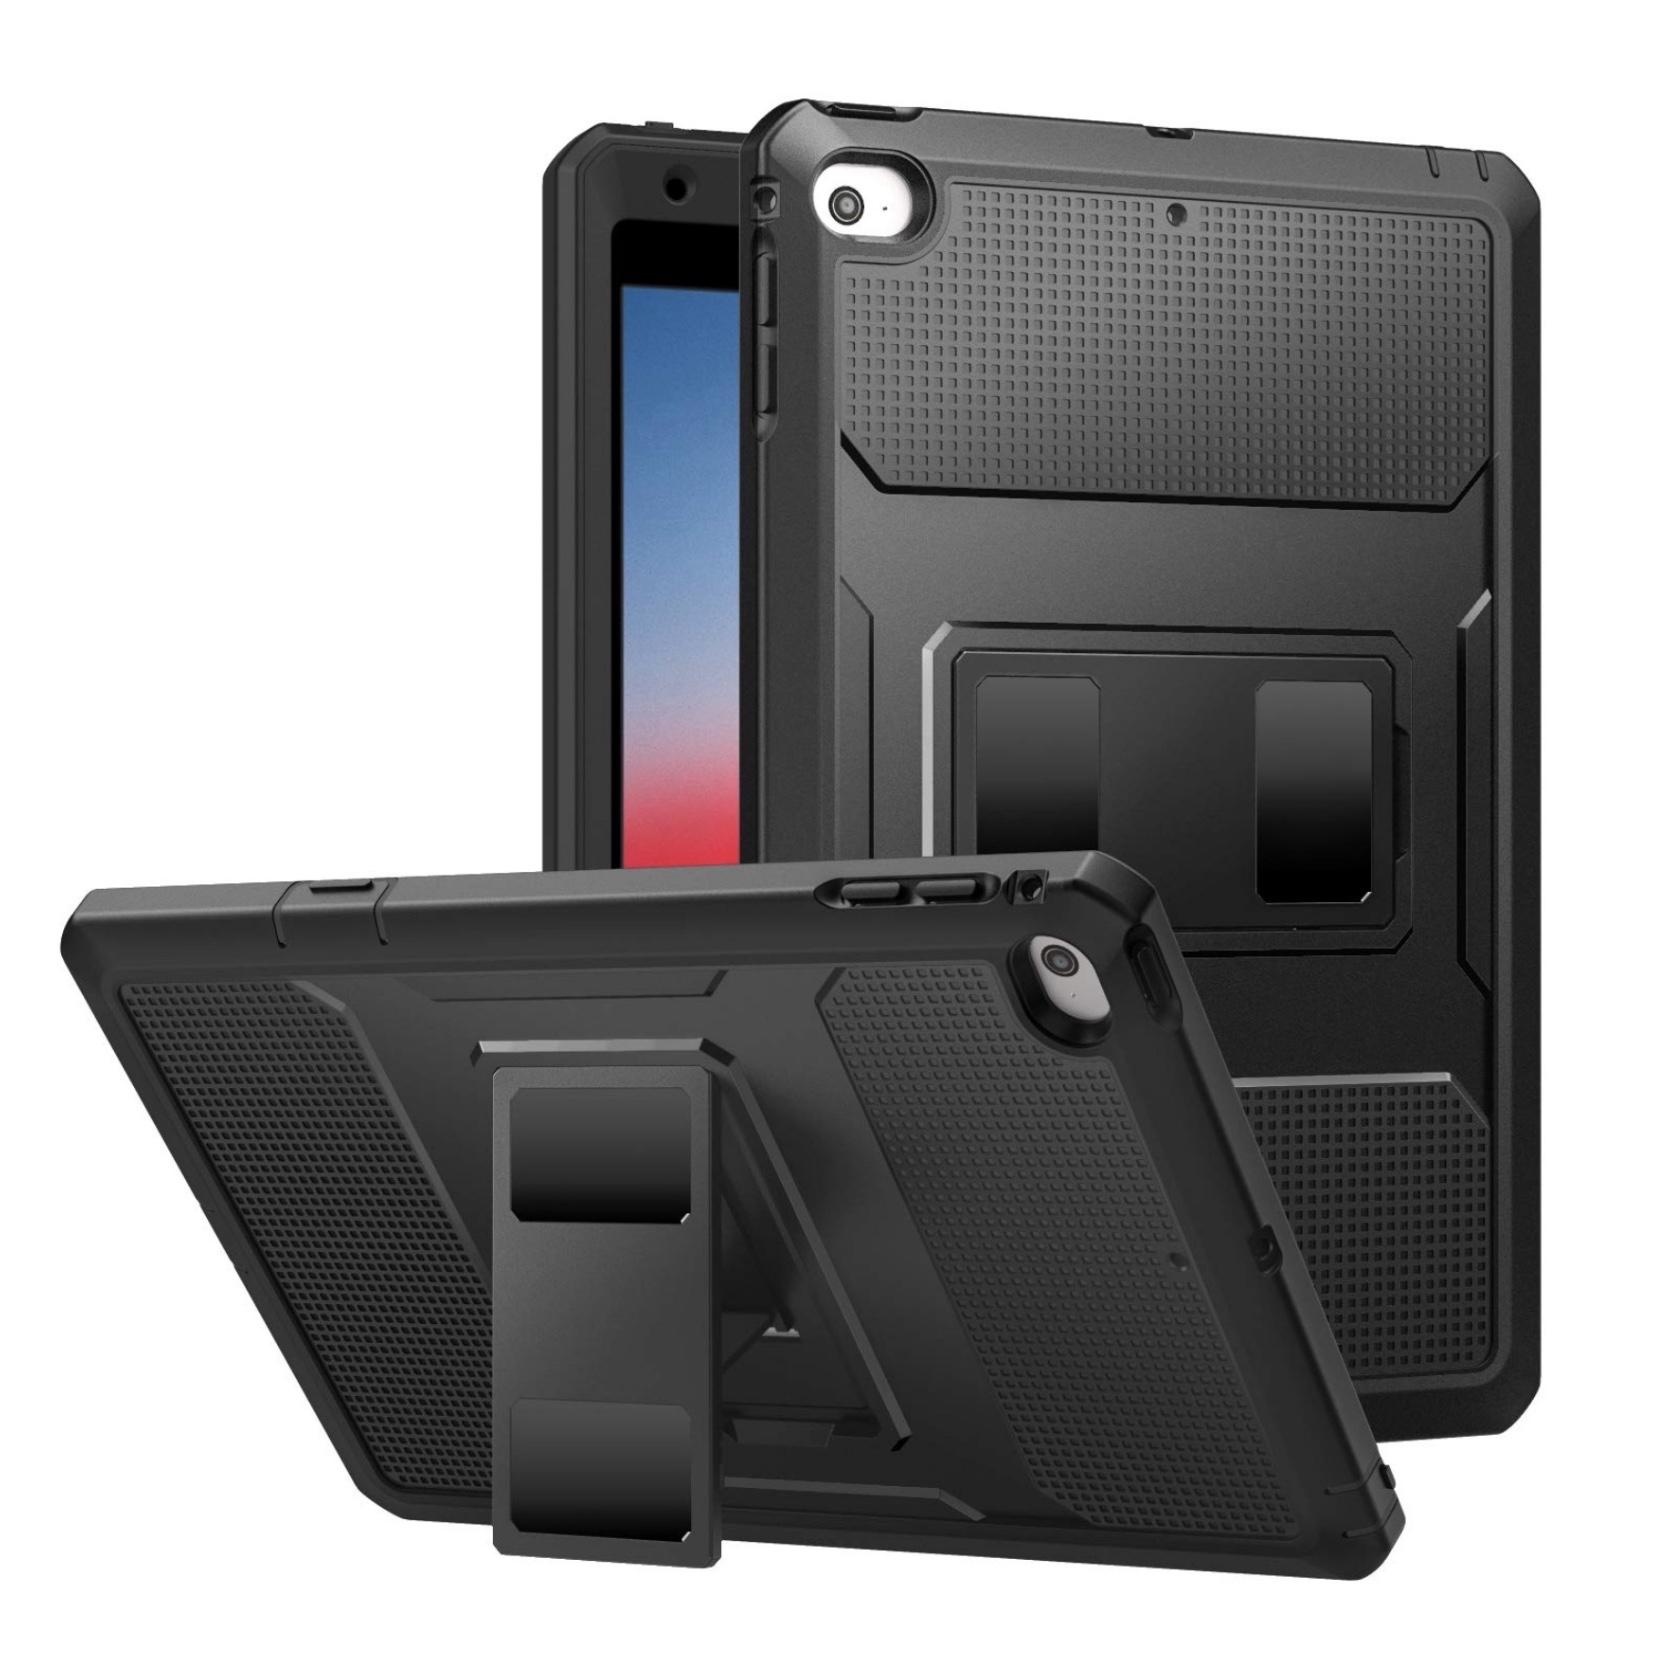 iPAD Mini 5 2019 7.9 pouces Coque de protection Pied et film rigide ecran